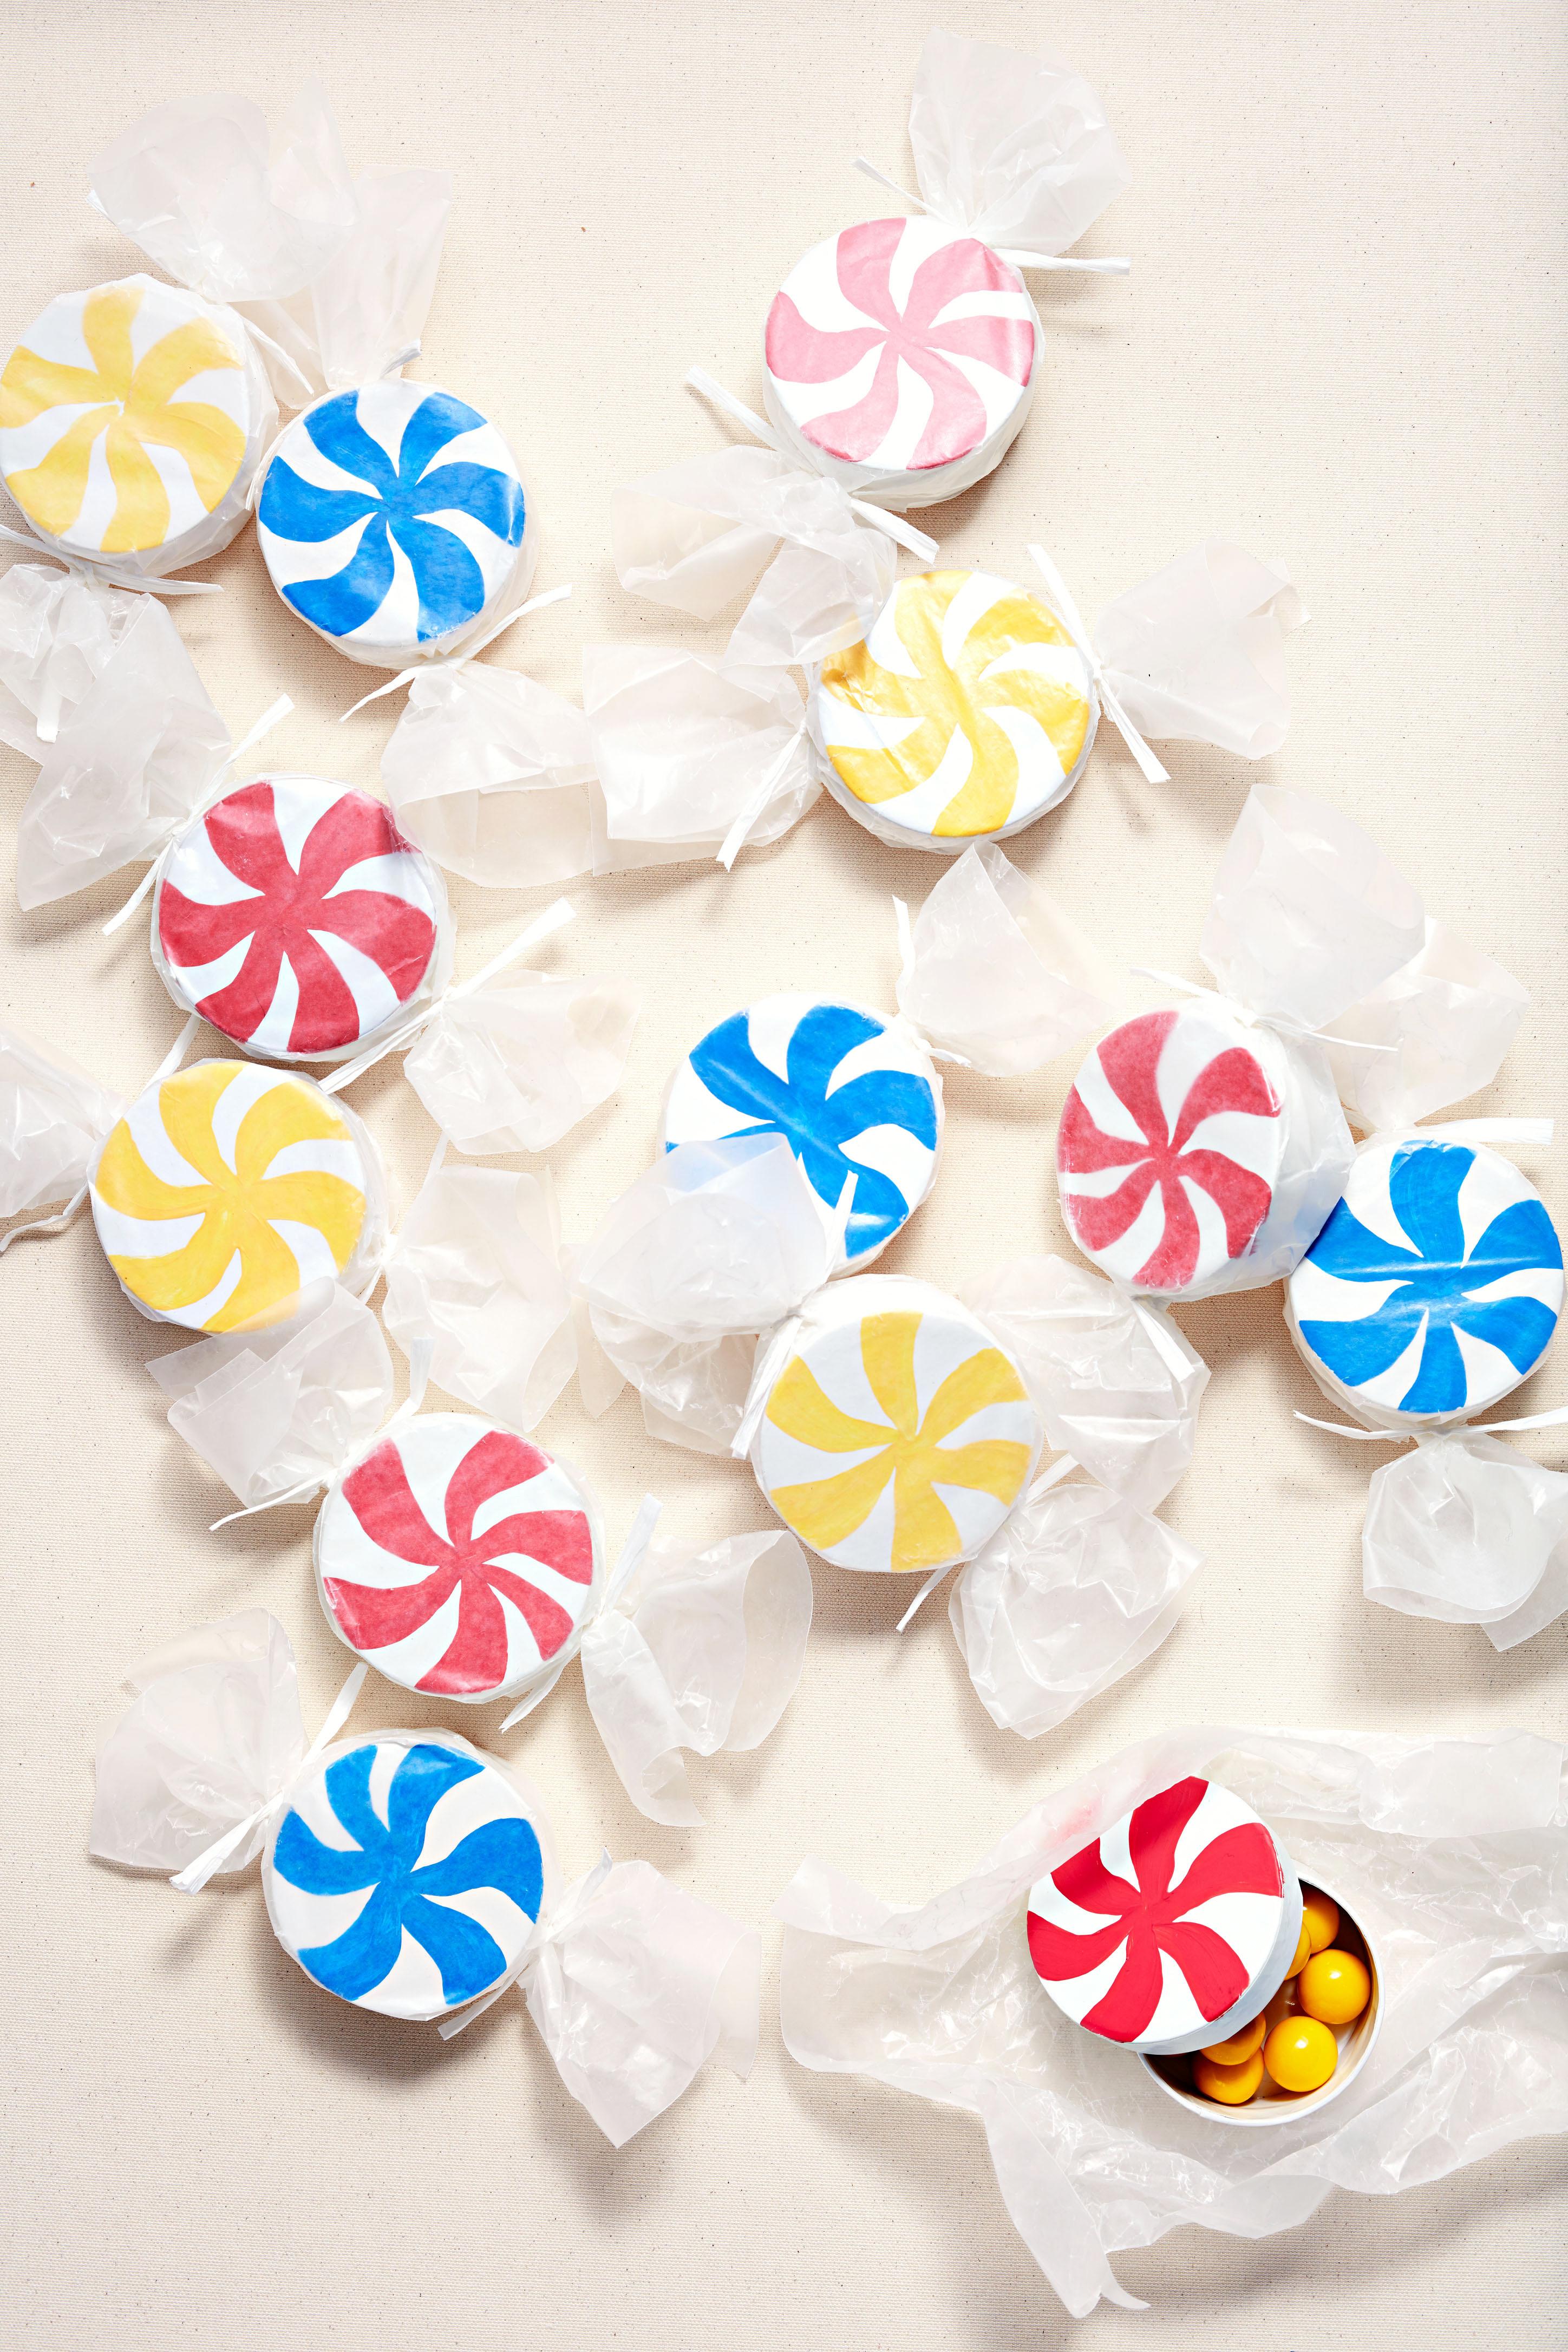 candies primary